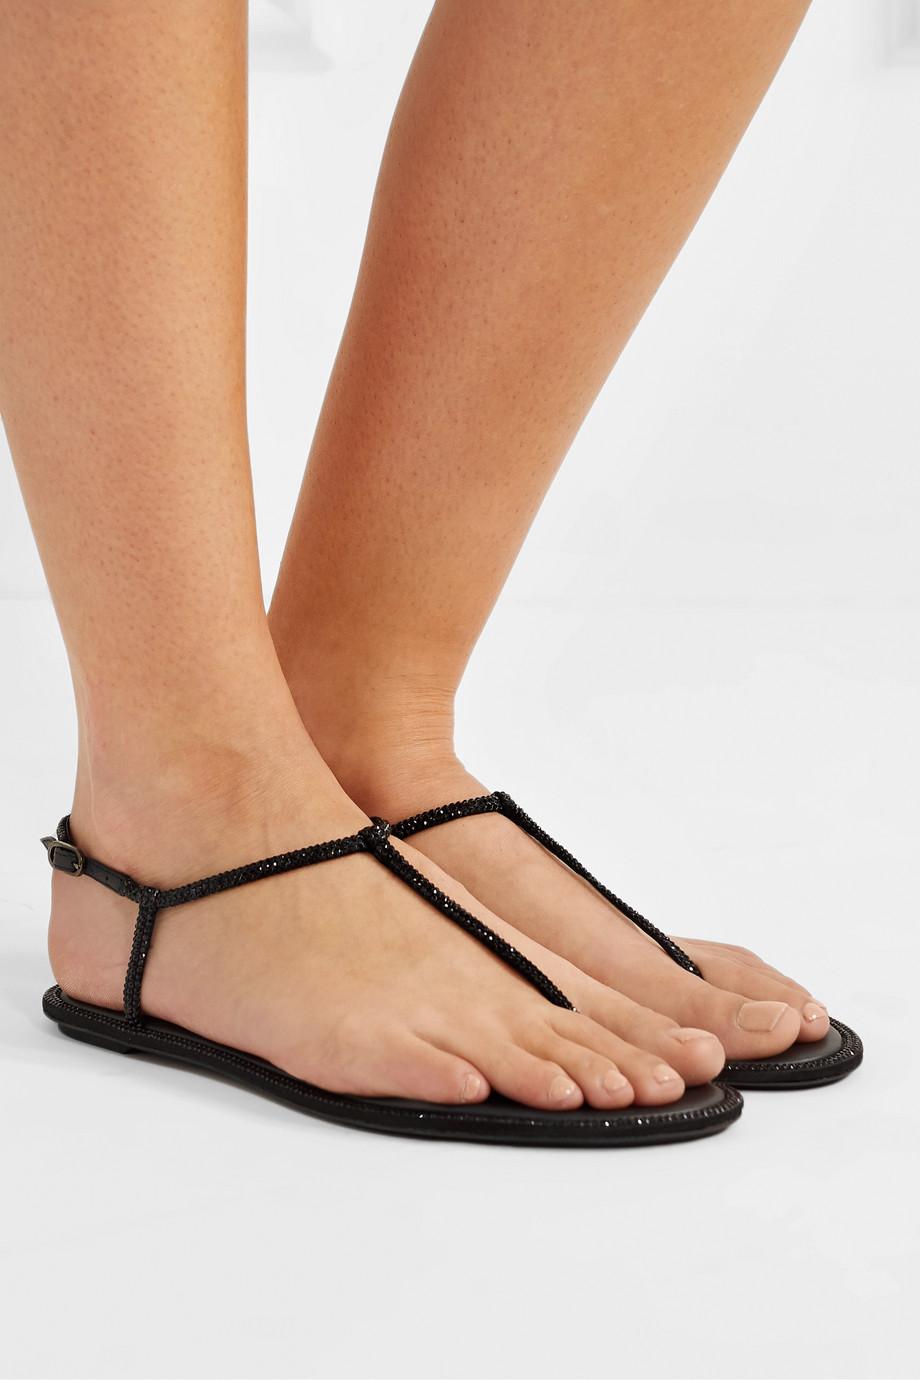 René Caovilla Diana 水晶缀饰缎布凉鞋